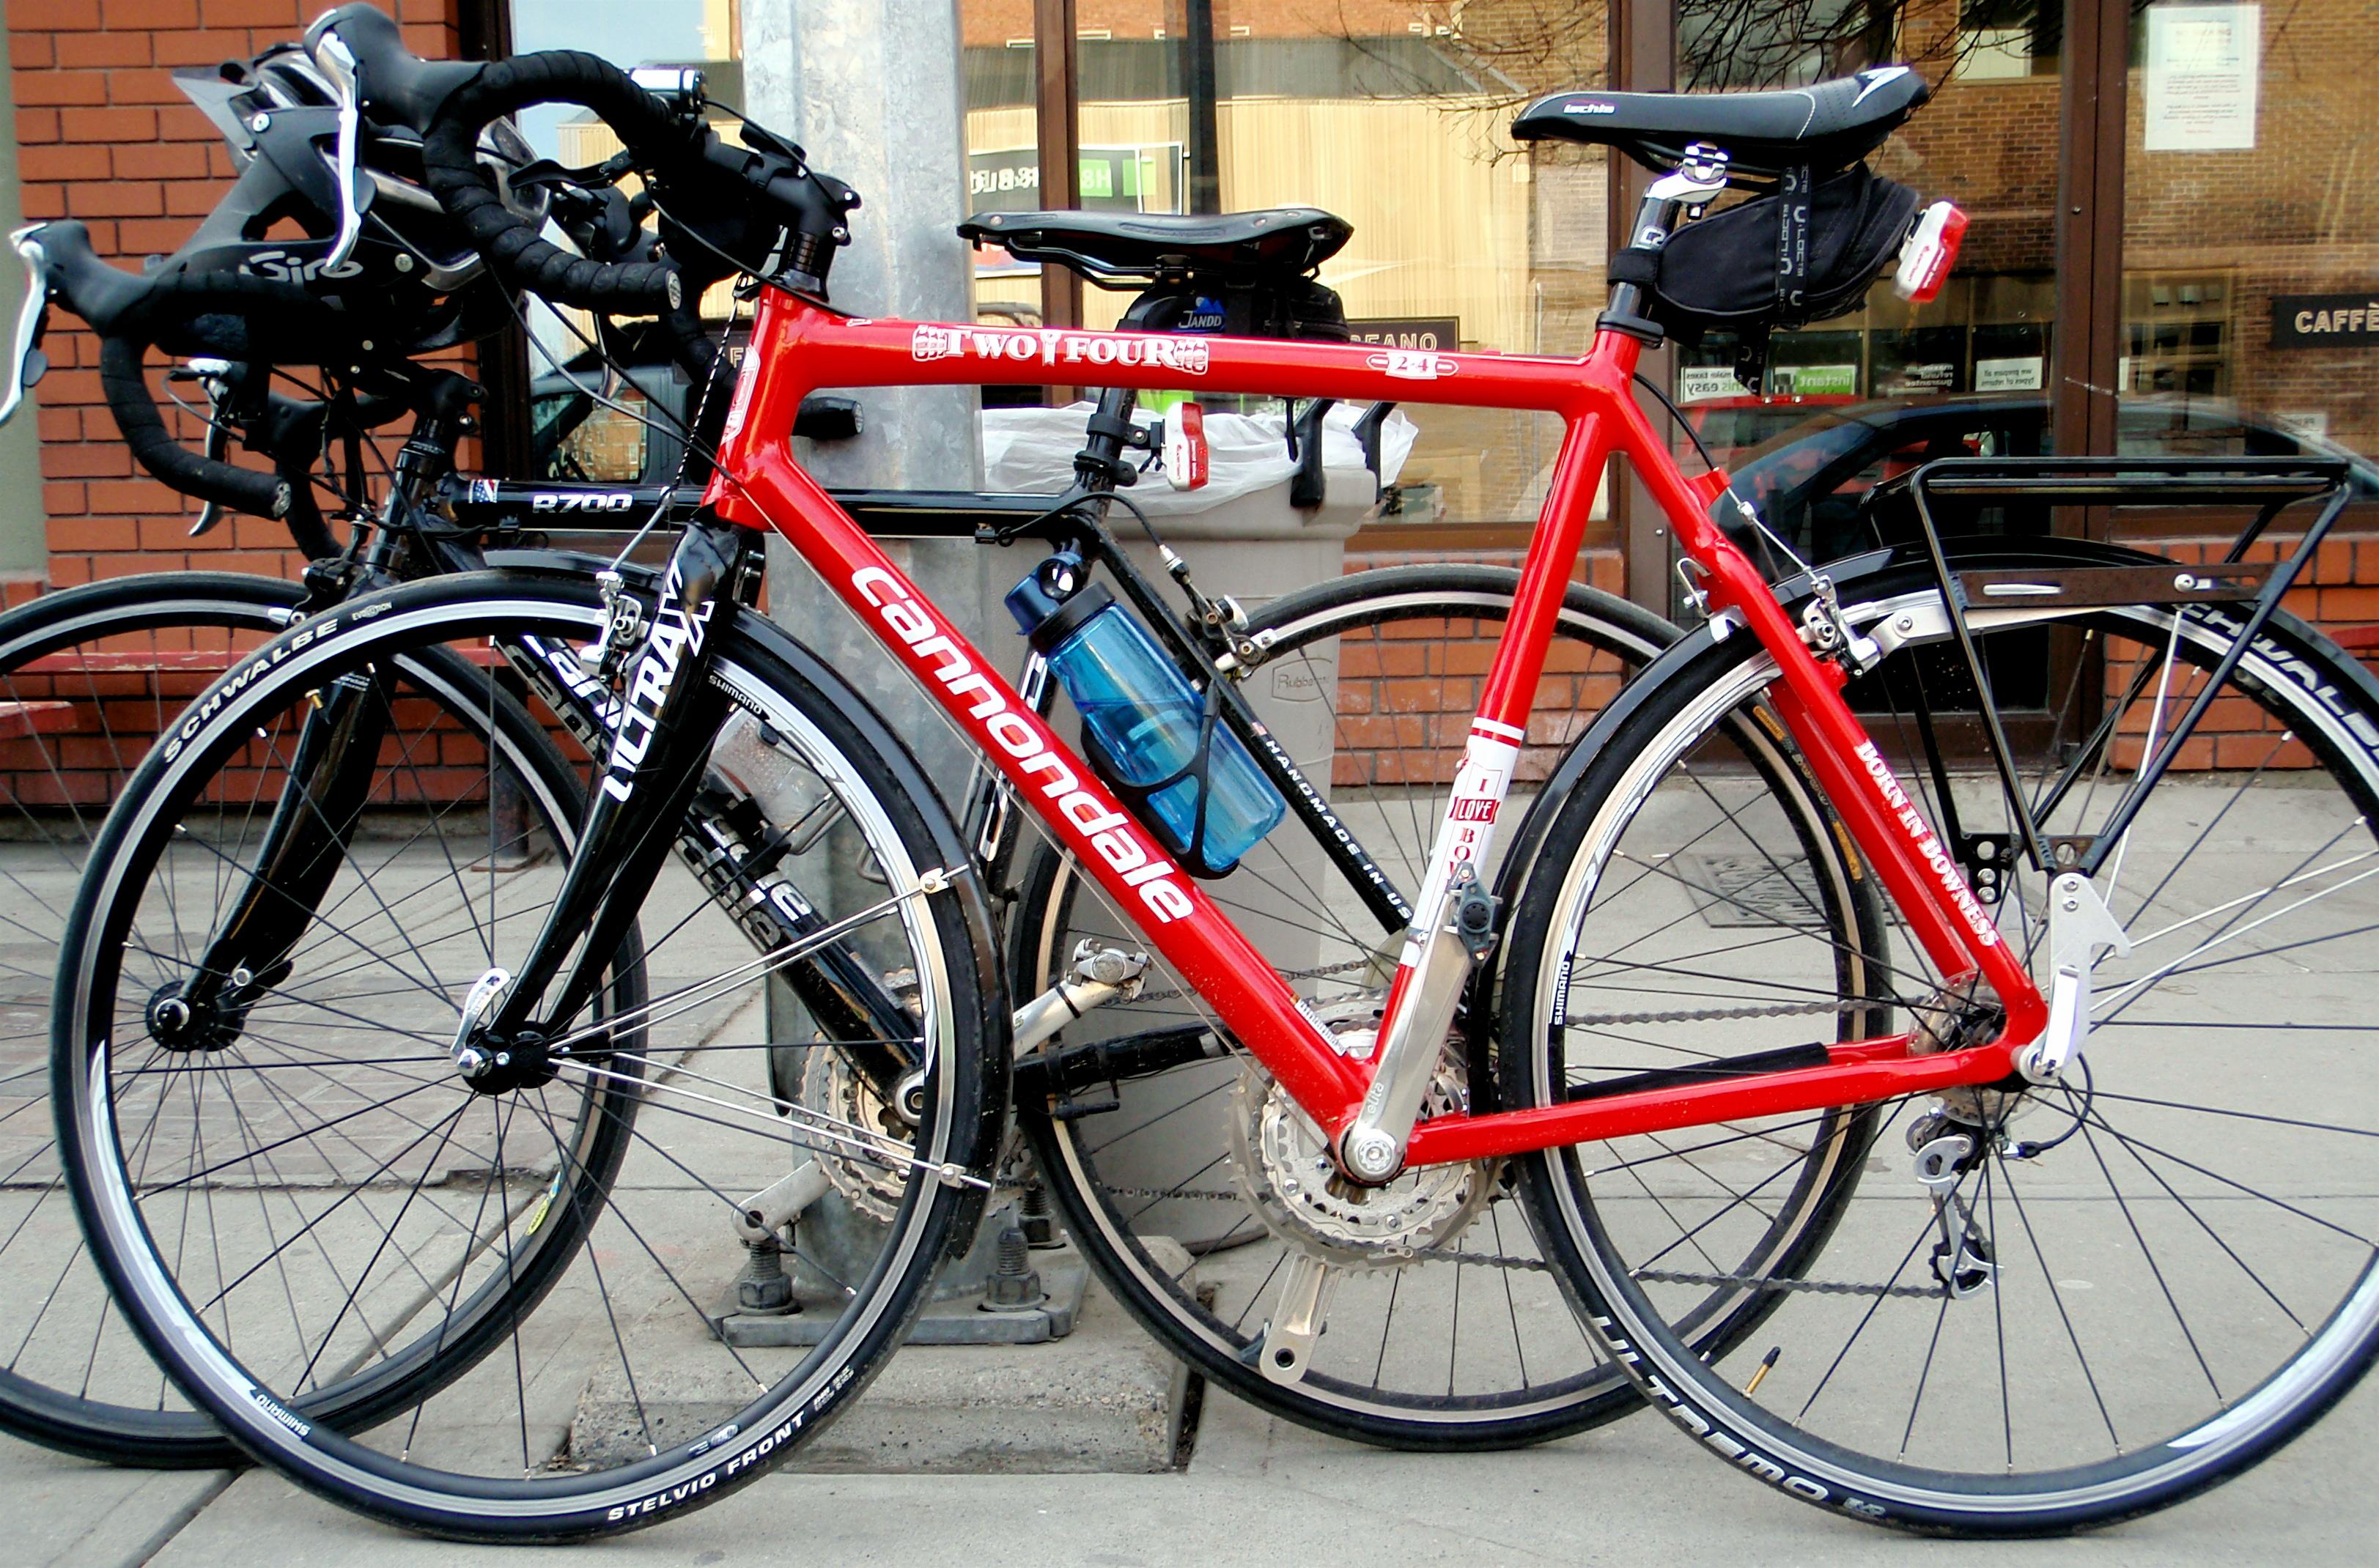 Sunbbicycle Racks